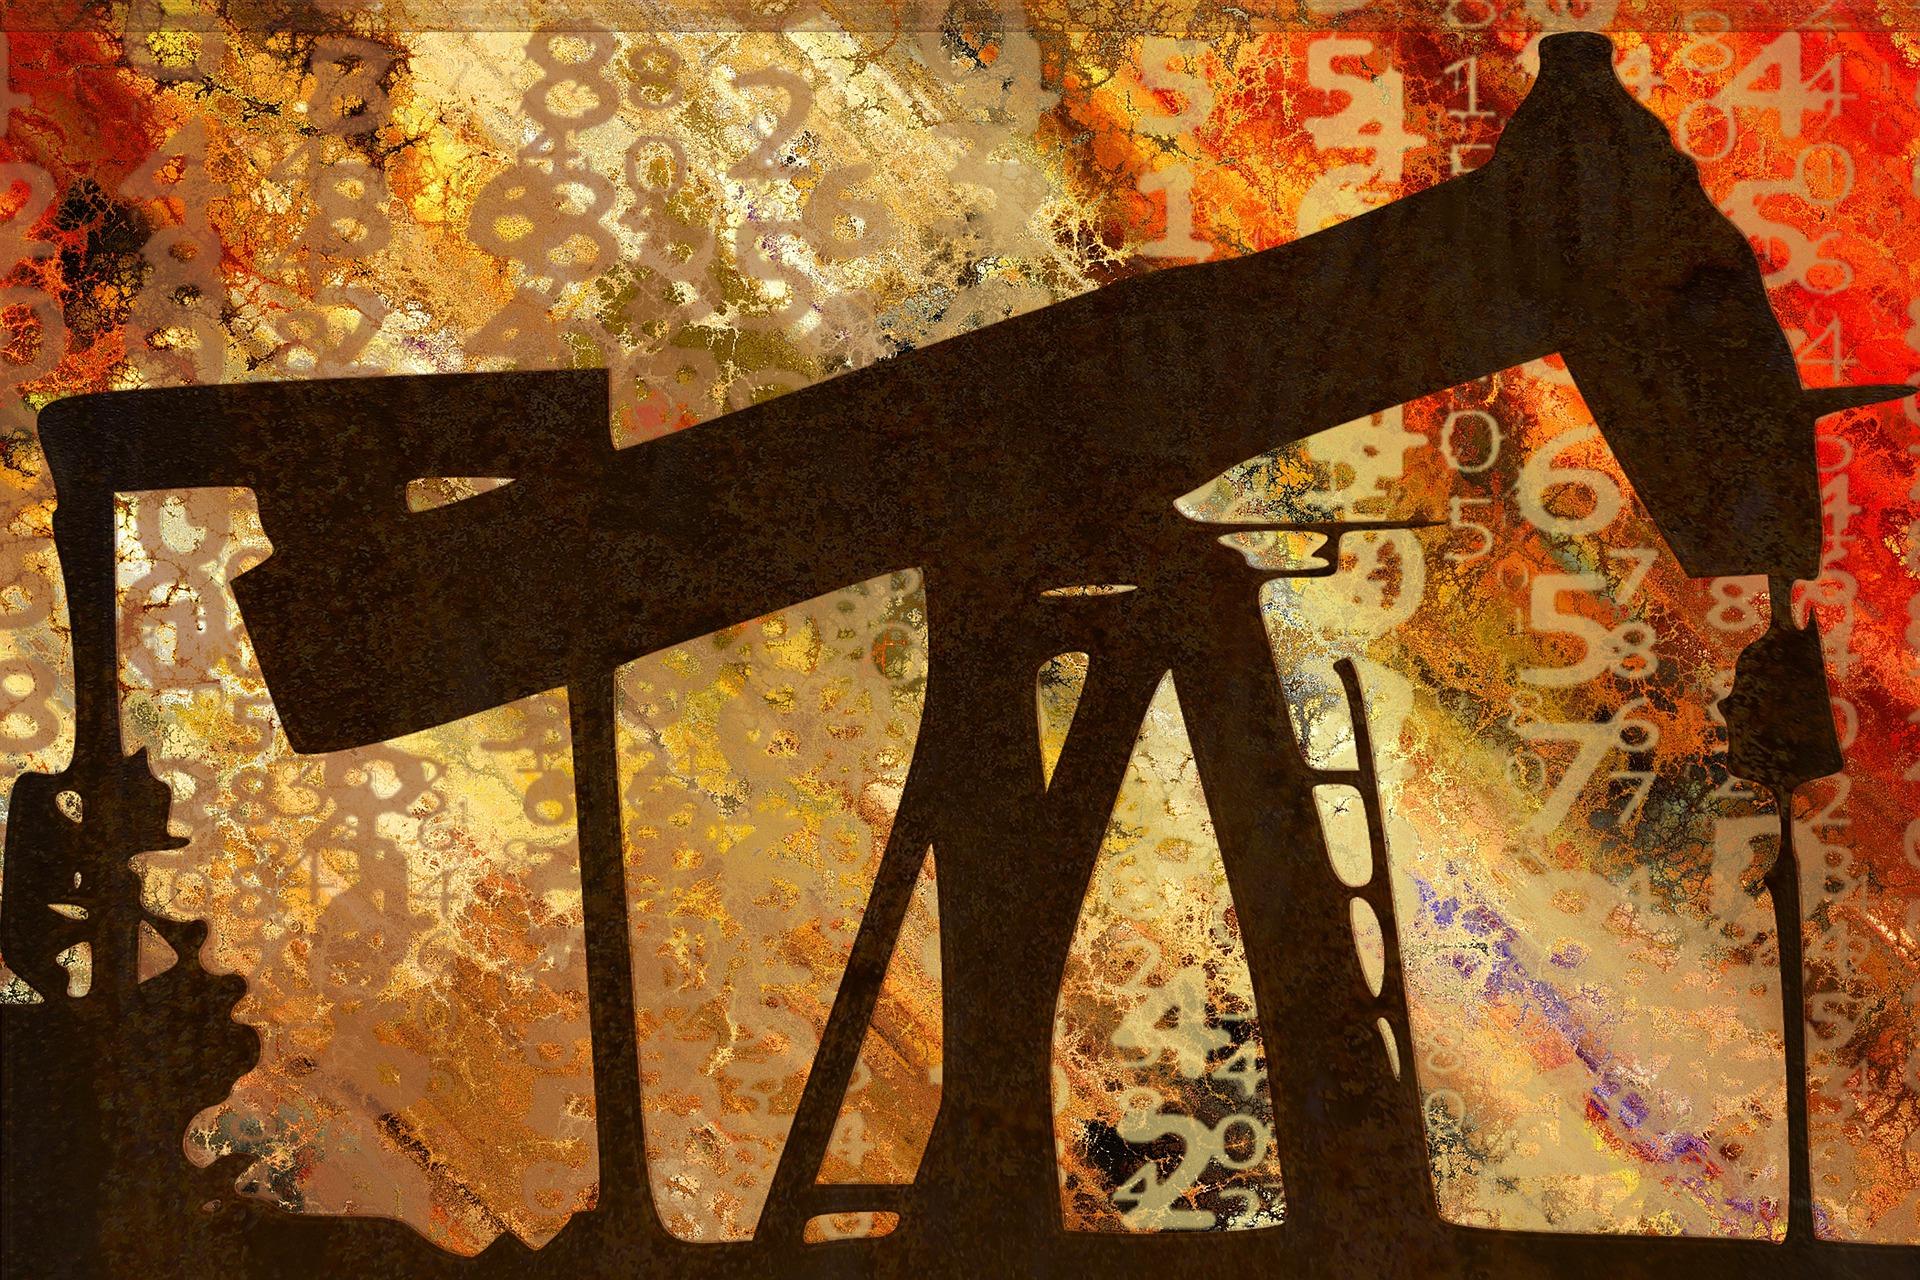 Focus on digital transformation during MENA oil & gas technology summit